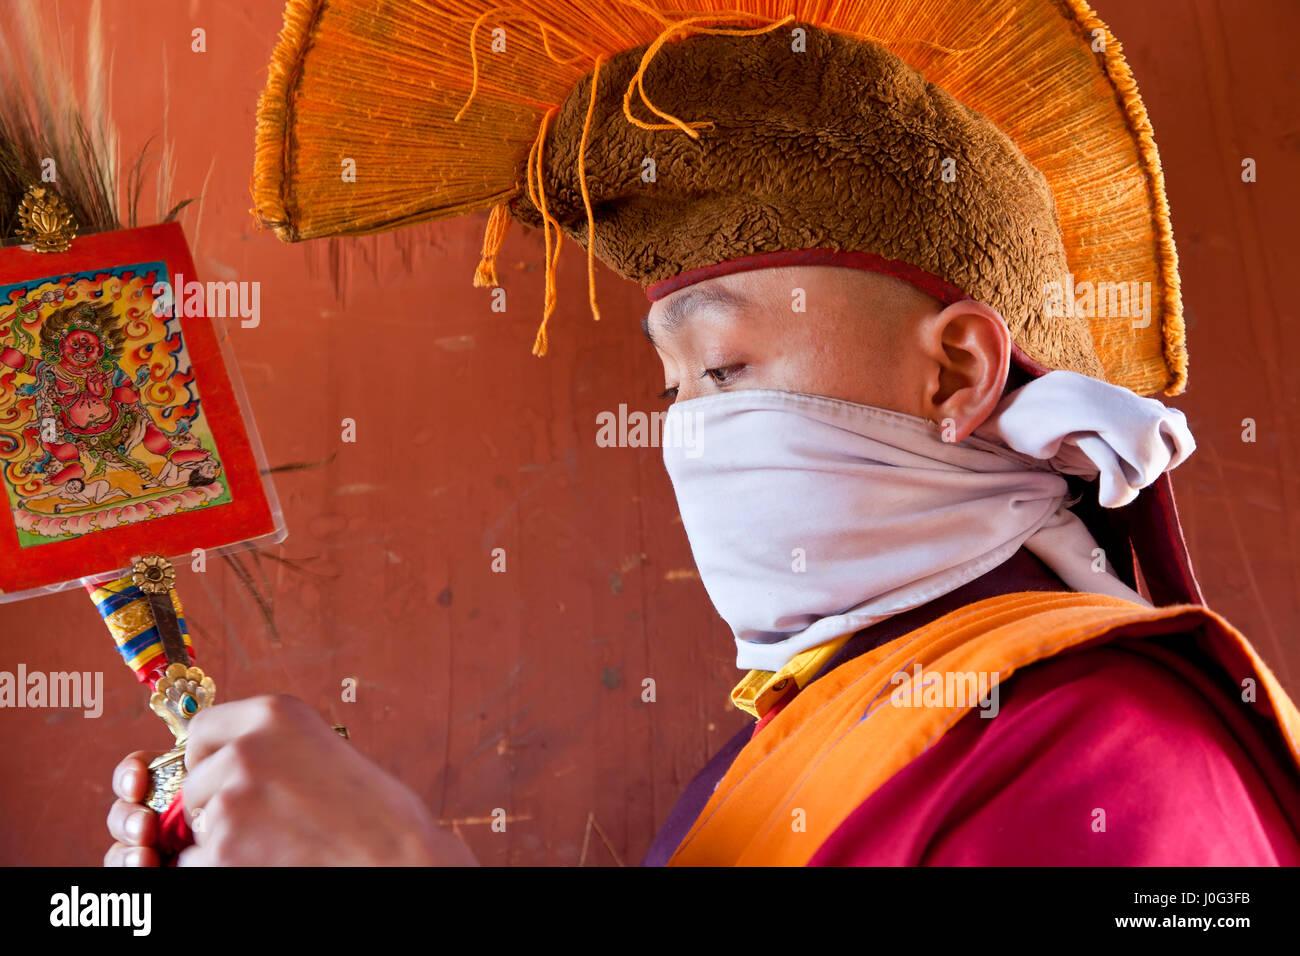 Monje, Tamshing Phala Chhoupa festival, Monasterio Tamshing, nr, Bumthang Jakar, Bhután Imagen De Stock